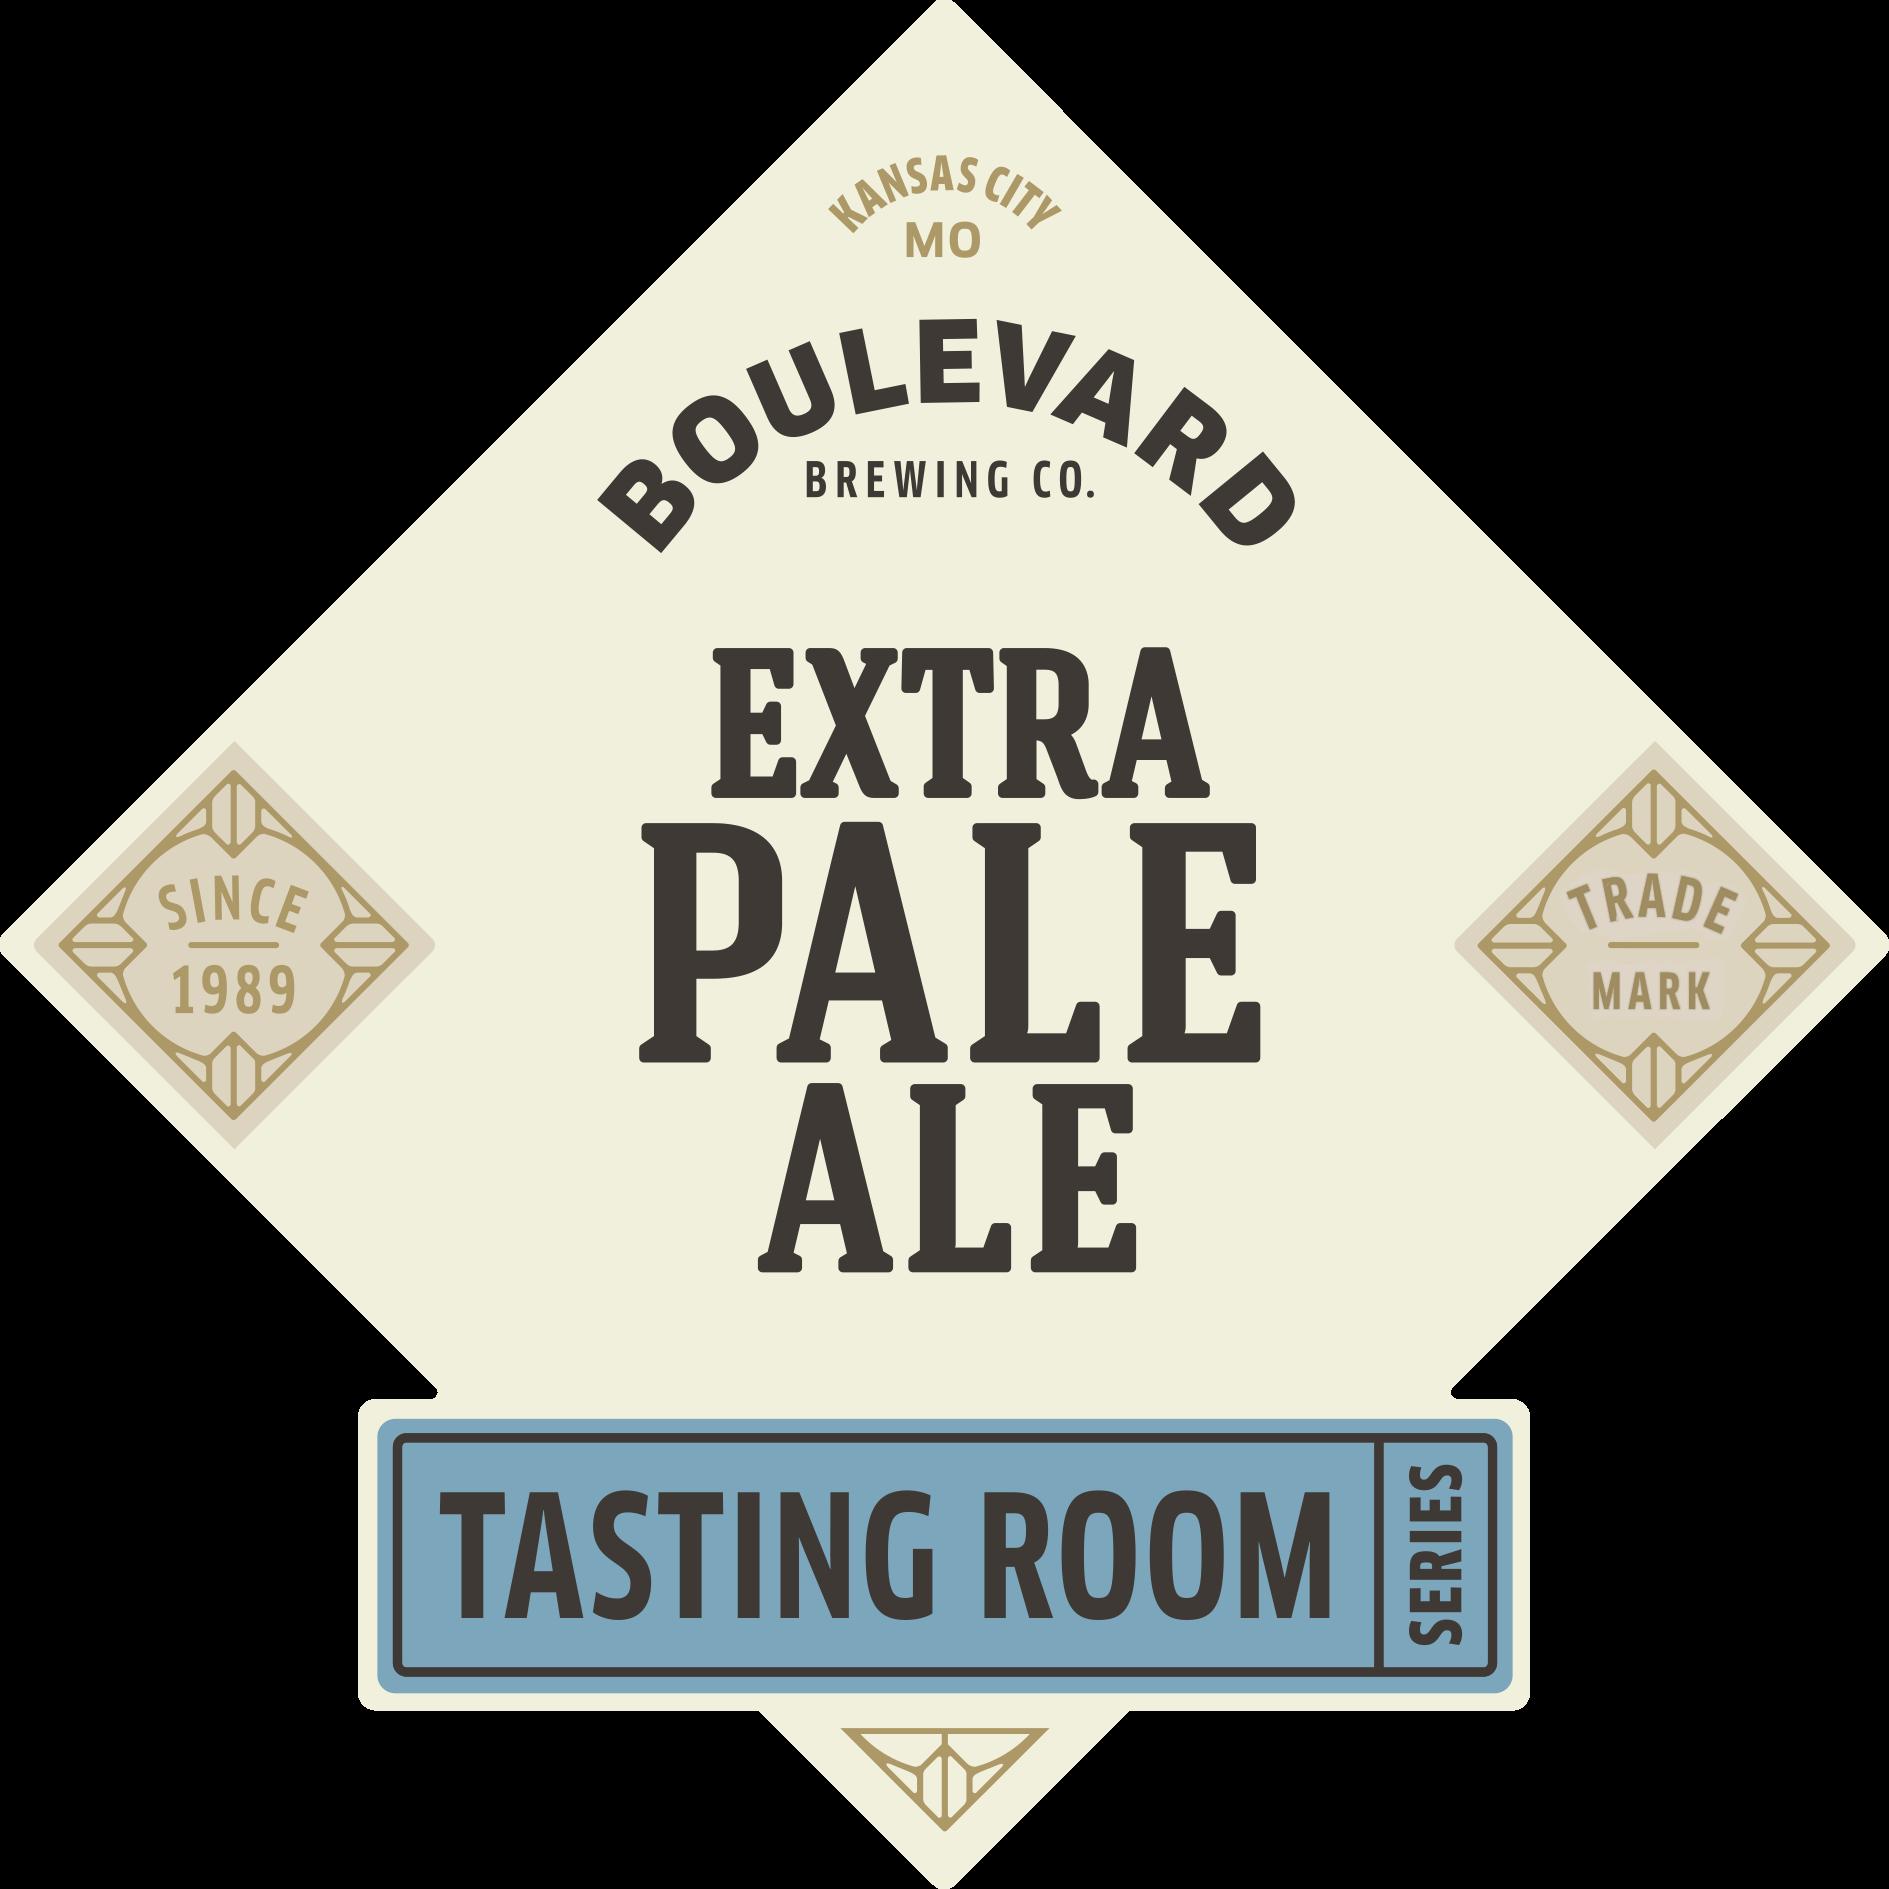 Tasting Room – Extra Pale Ale